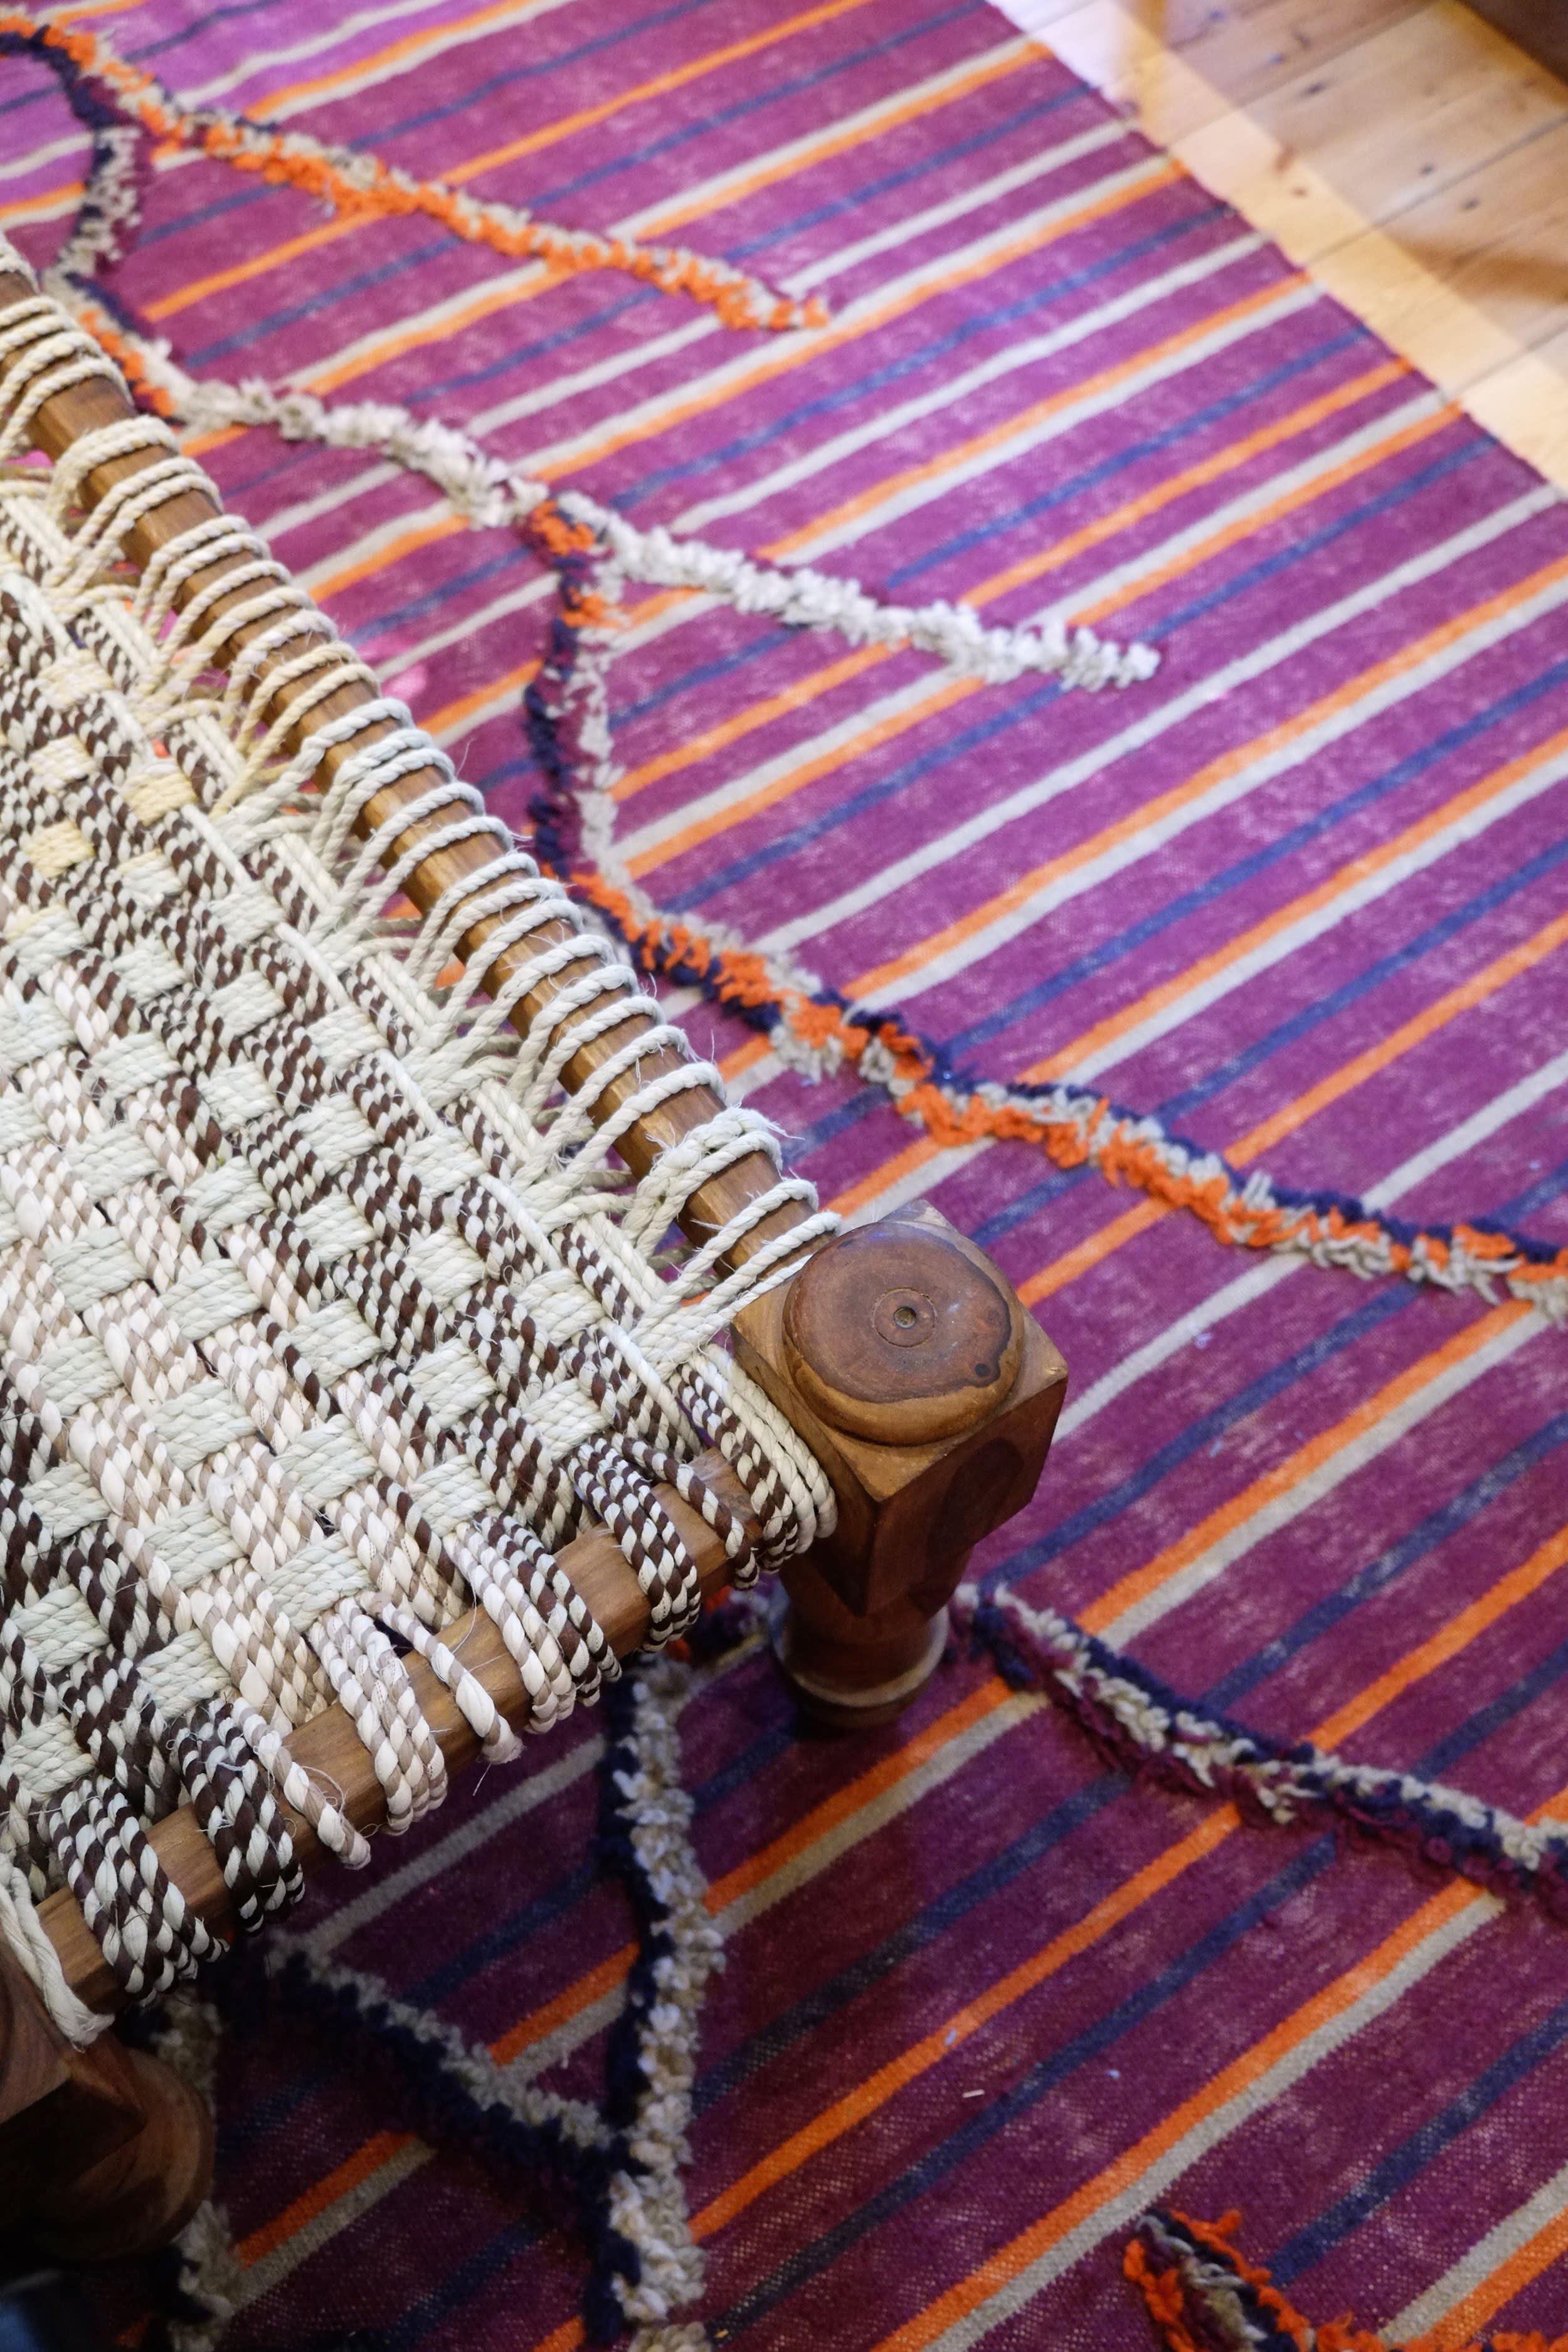 Colorful textiles